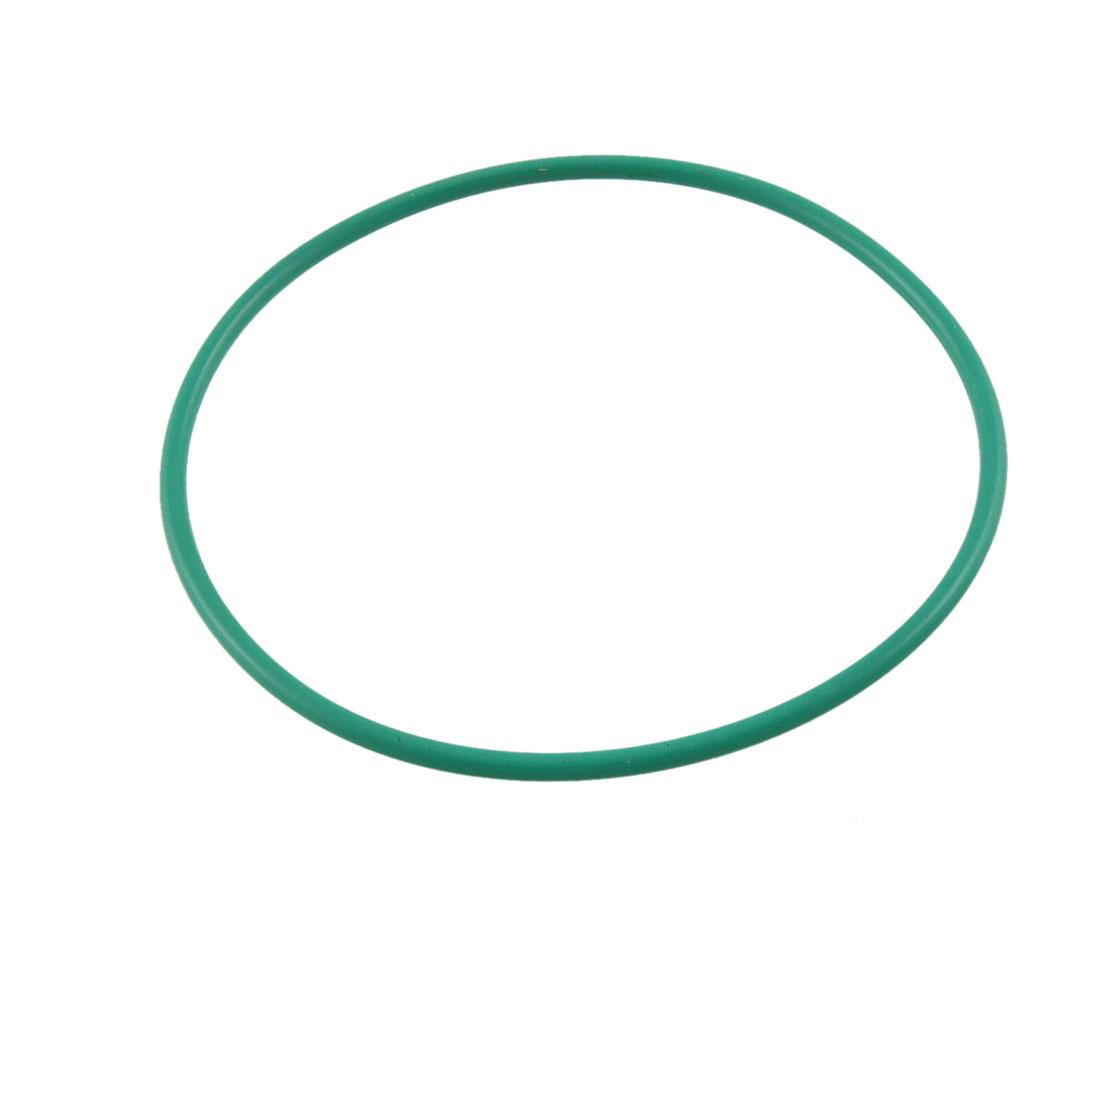 Fluorine Rubber O Ring Oil Sealing Gasket 75mm x 70mm x 2.5mm